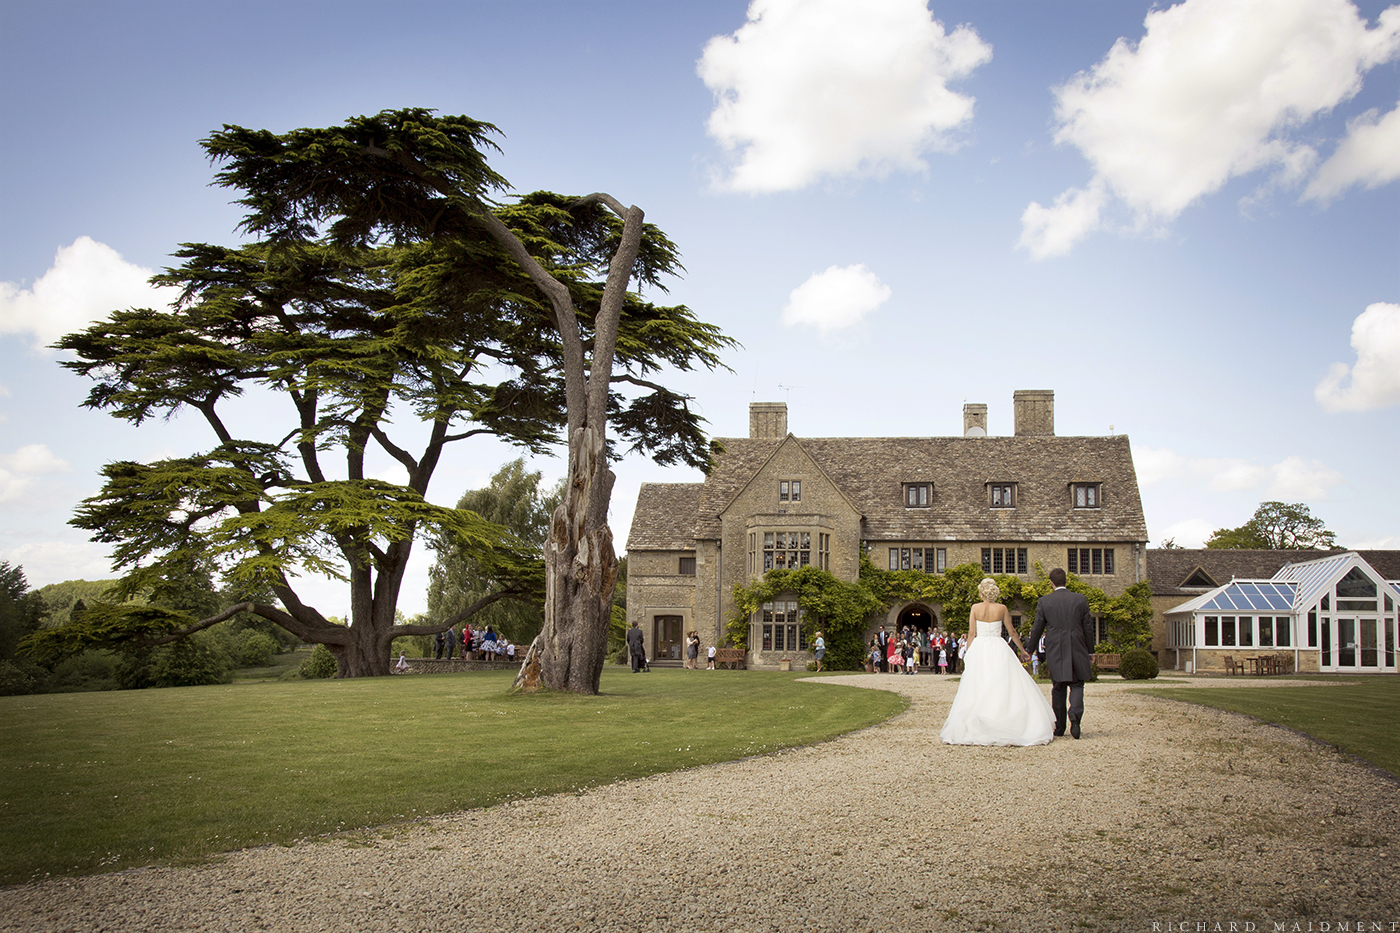 Richard Maidment - Wedding Photography (117).jpg